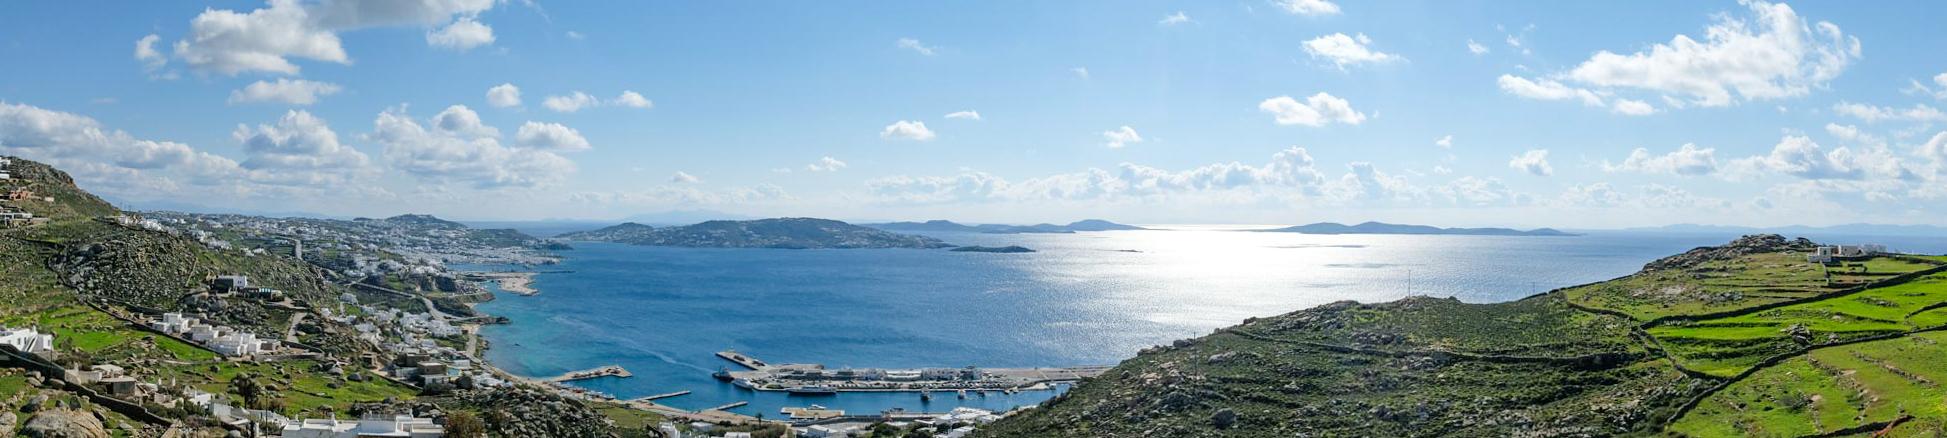 Mykonos View Location